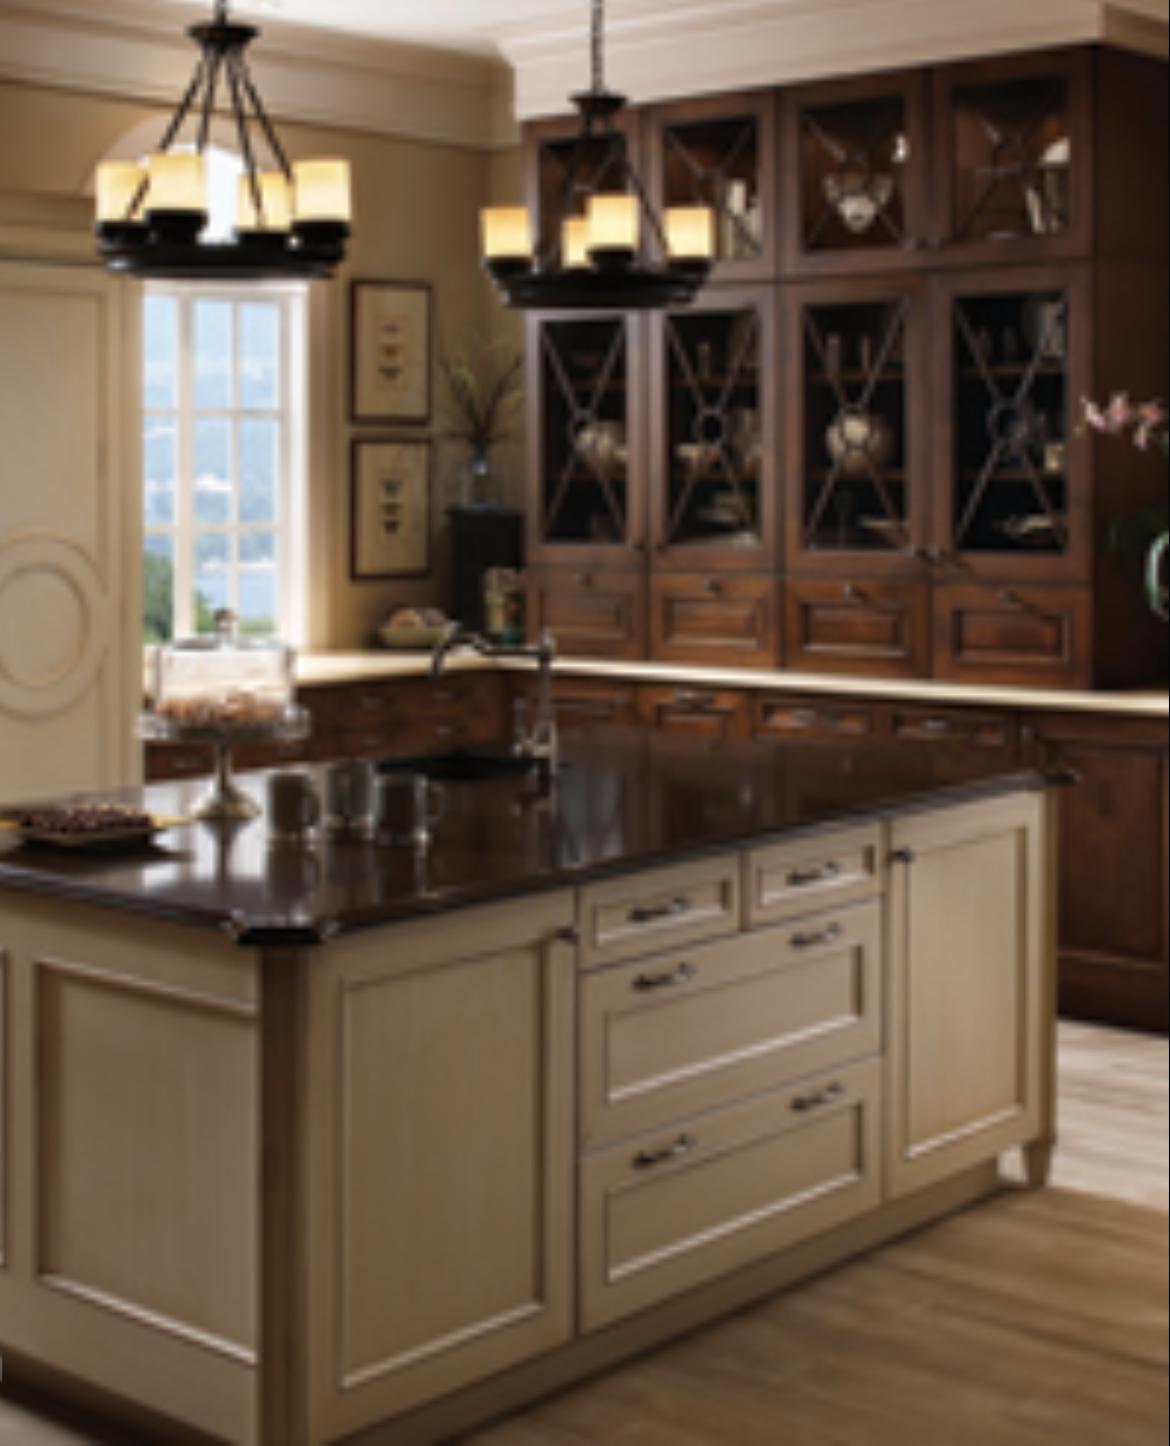 What Is The Right Cabinet For My Kitchen Terravista Interior Design Group Cabinet Design Kitchen Cabinet